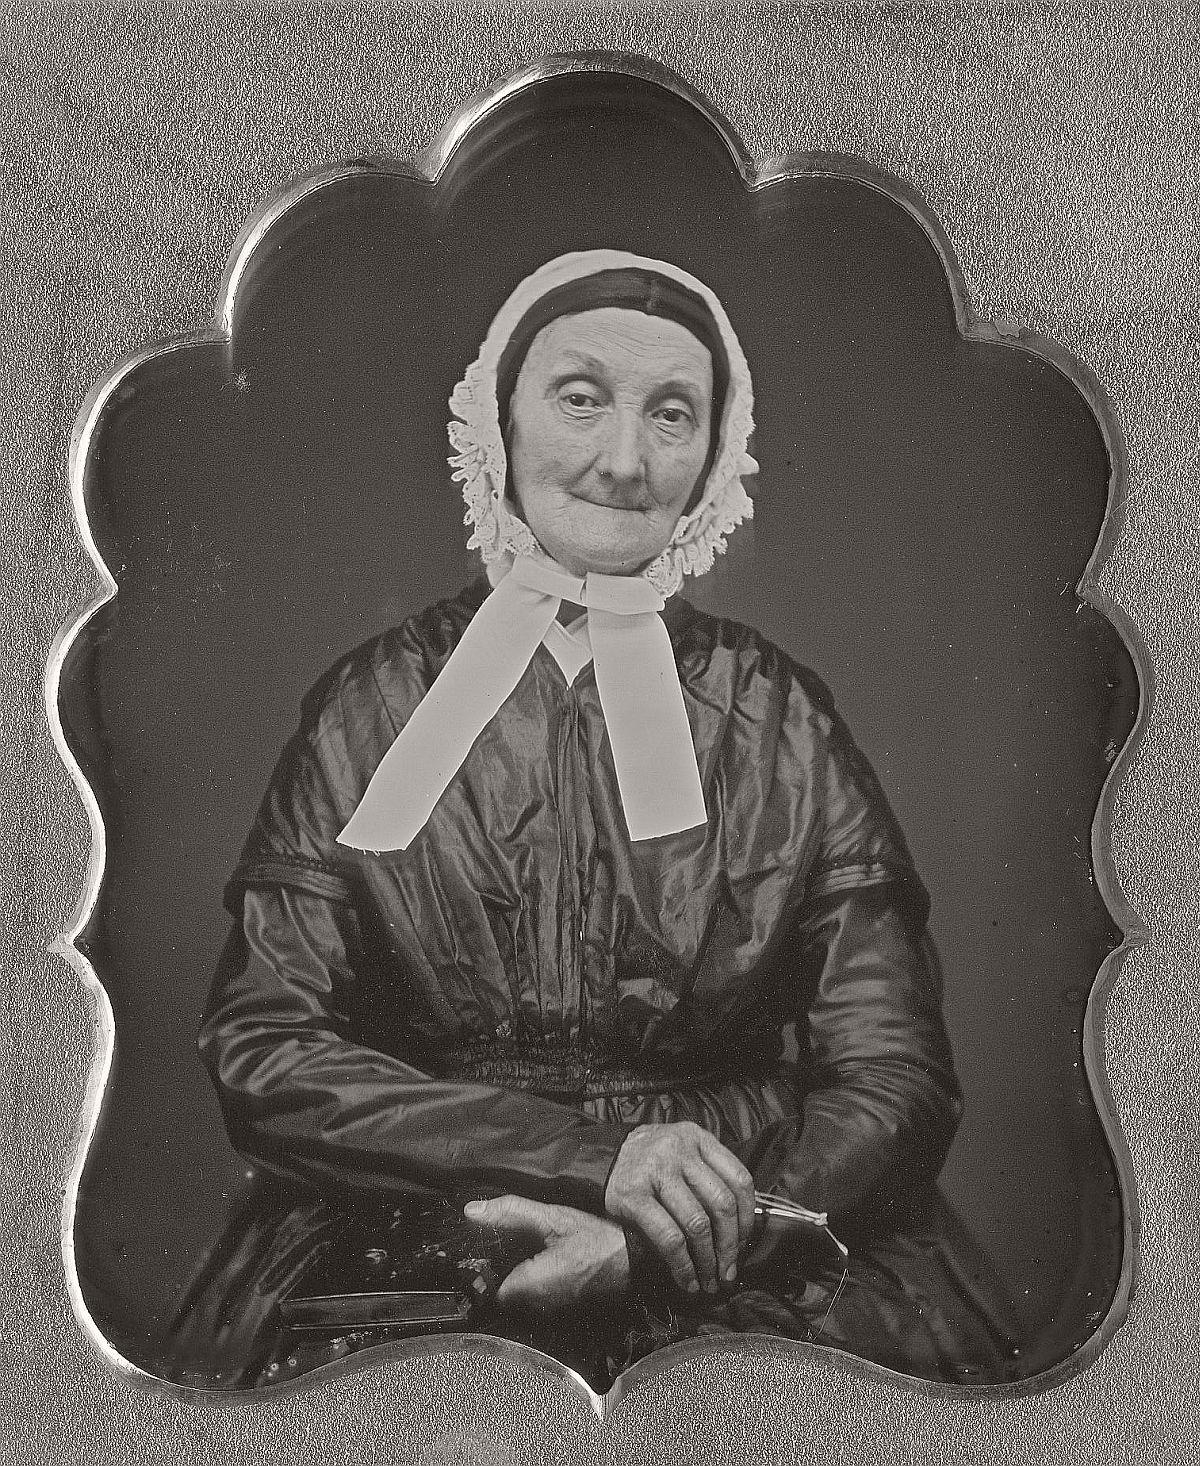 daguerreotype-portrait-ladies-born-in-the-late-18th-century-1700s-vintage-26